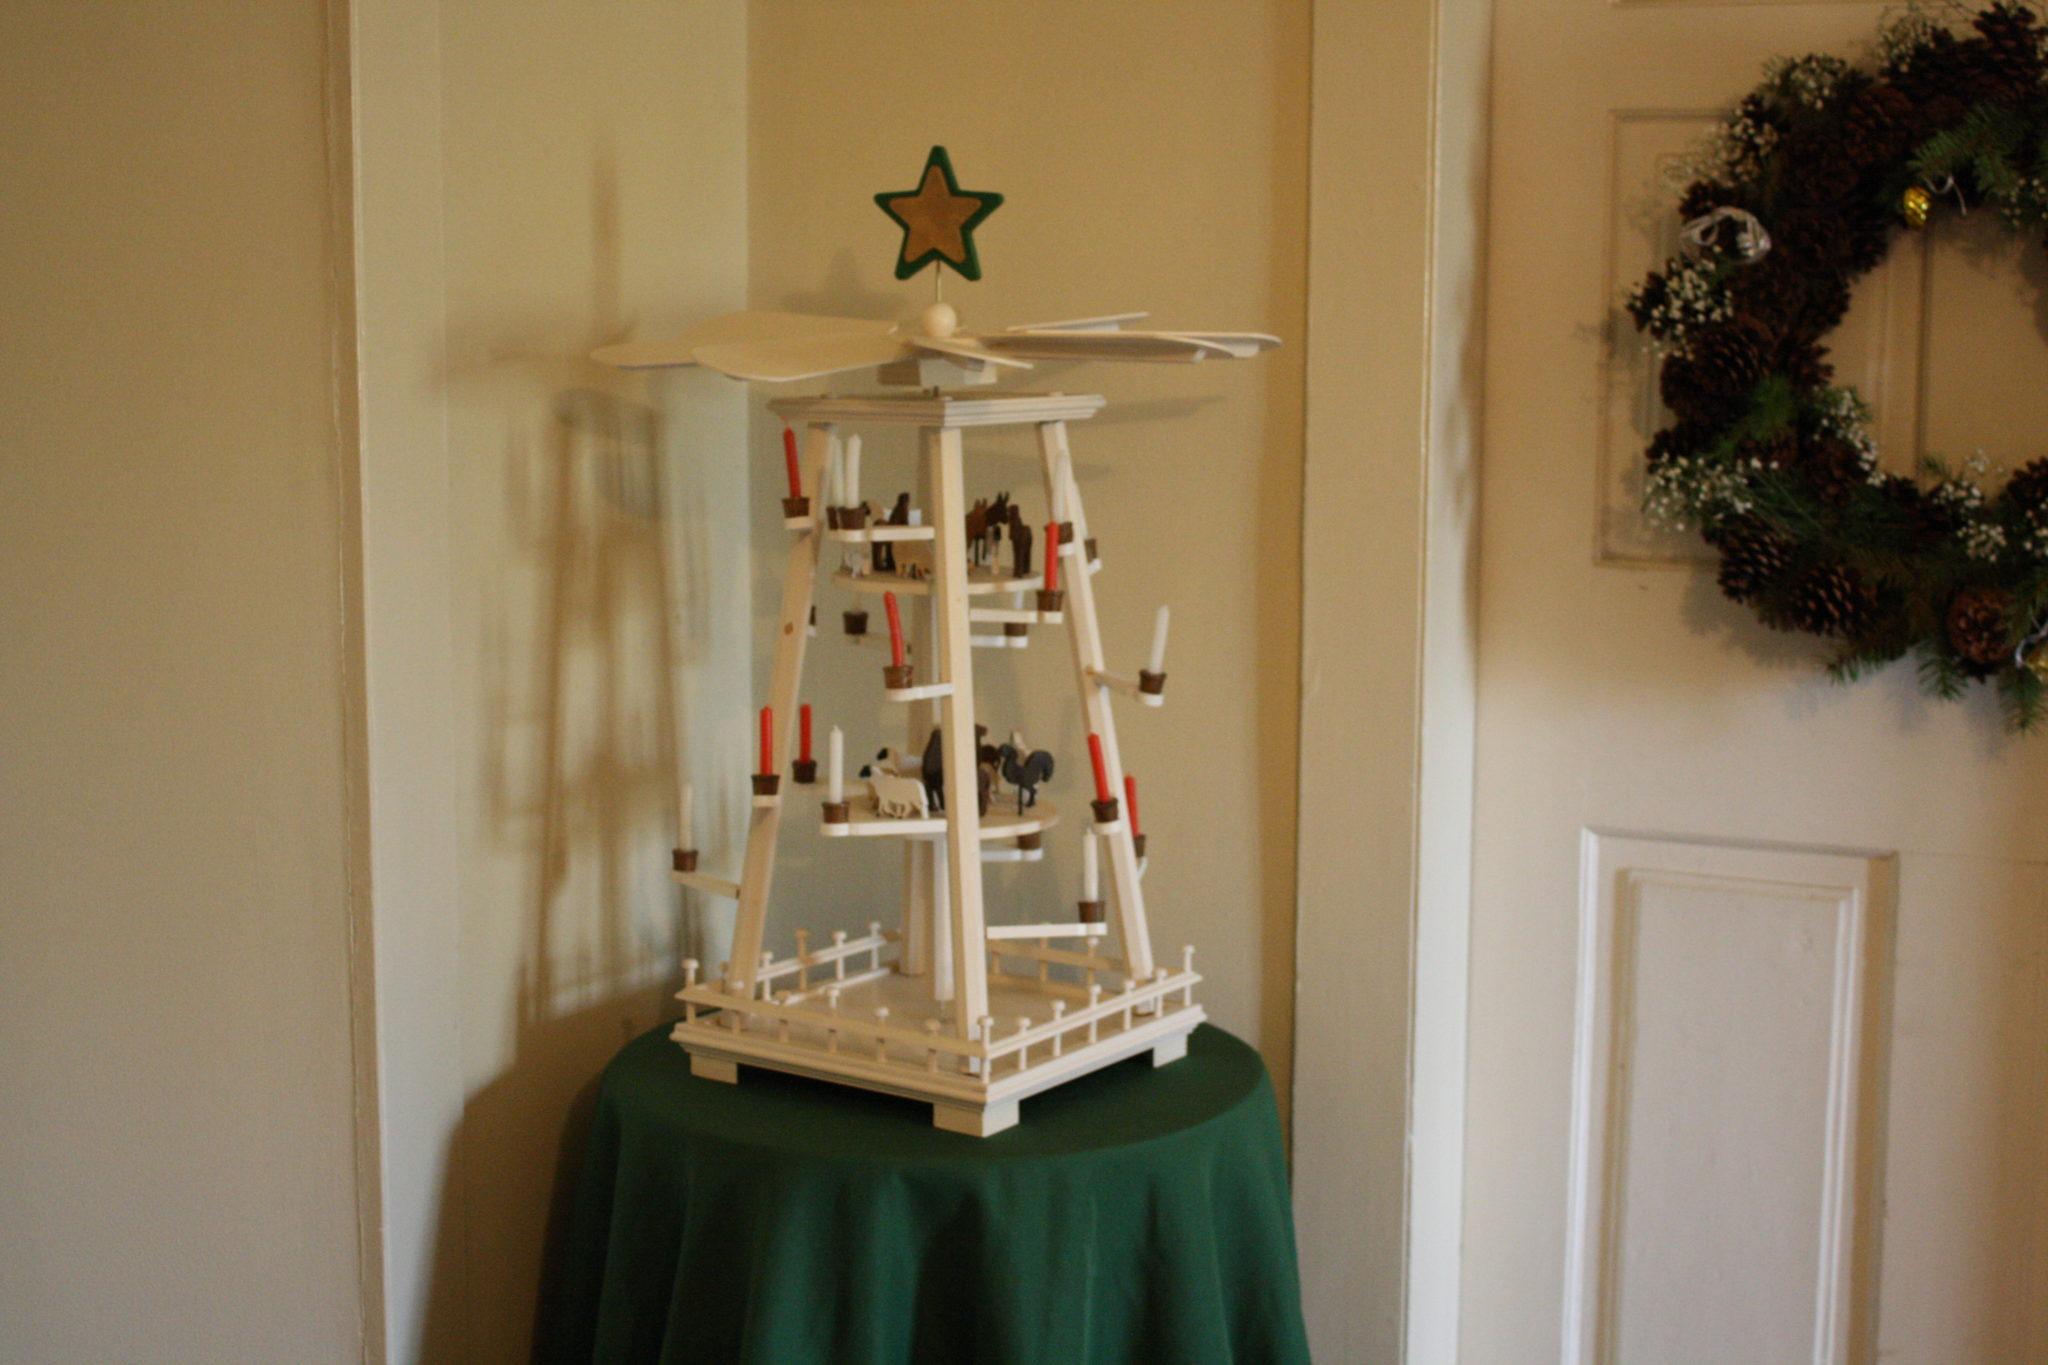 German Christmas Tree.German Christmas Tree 4 Rancho Los Cerritos Historic Site